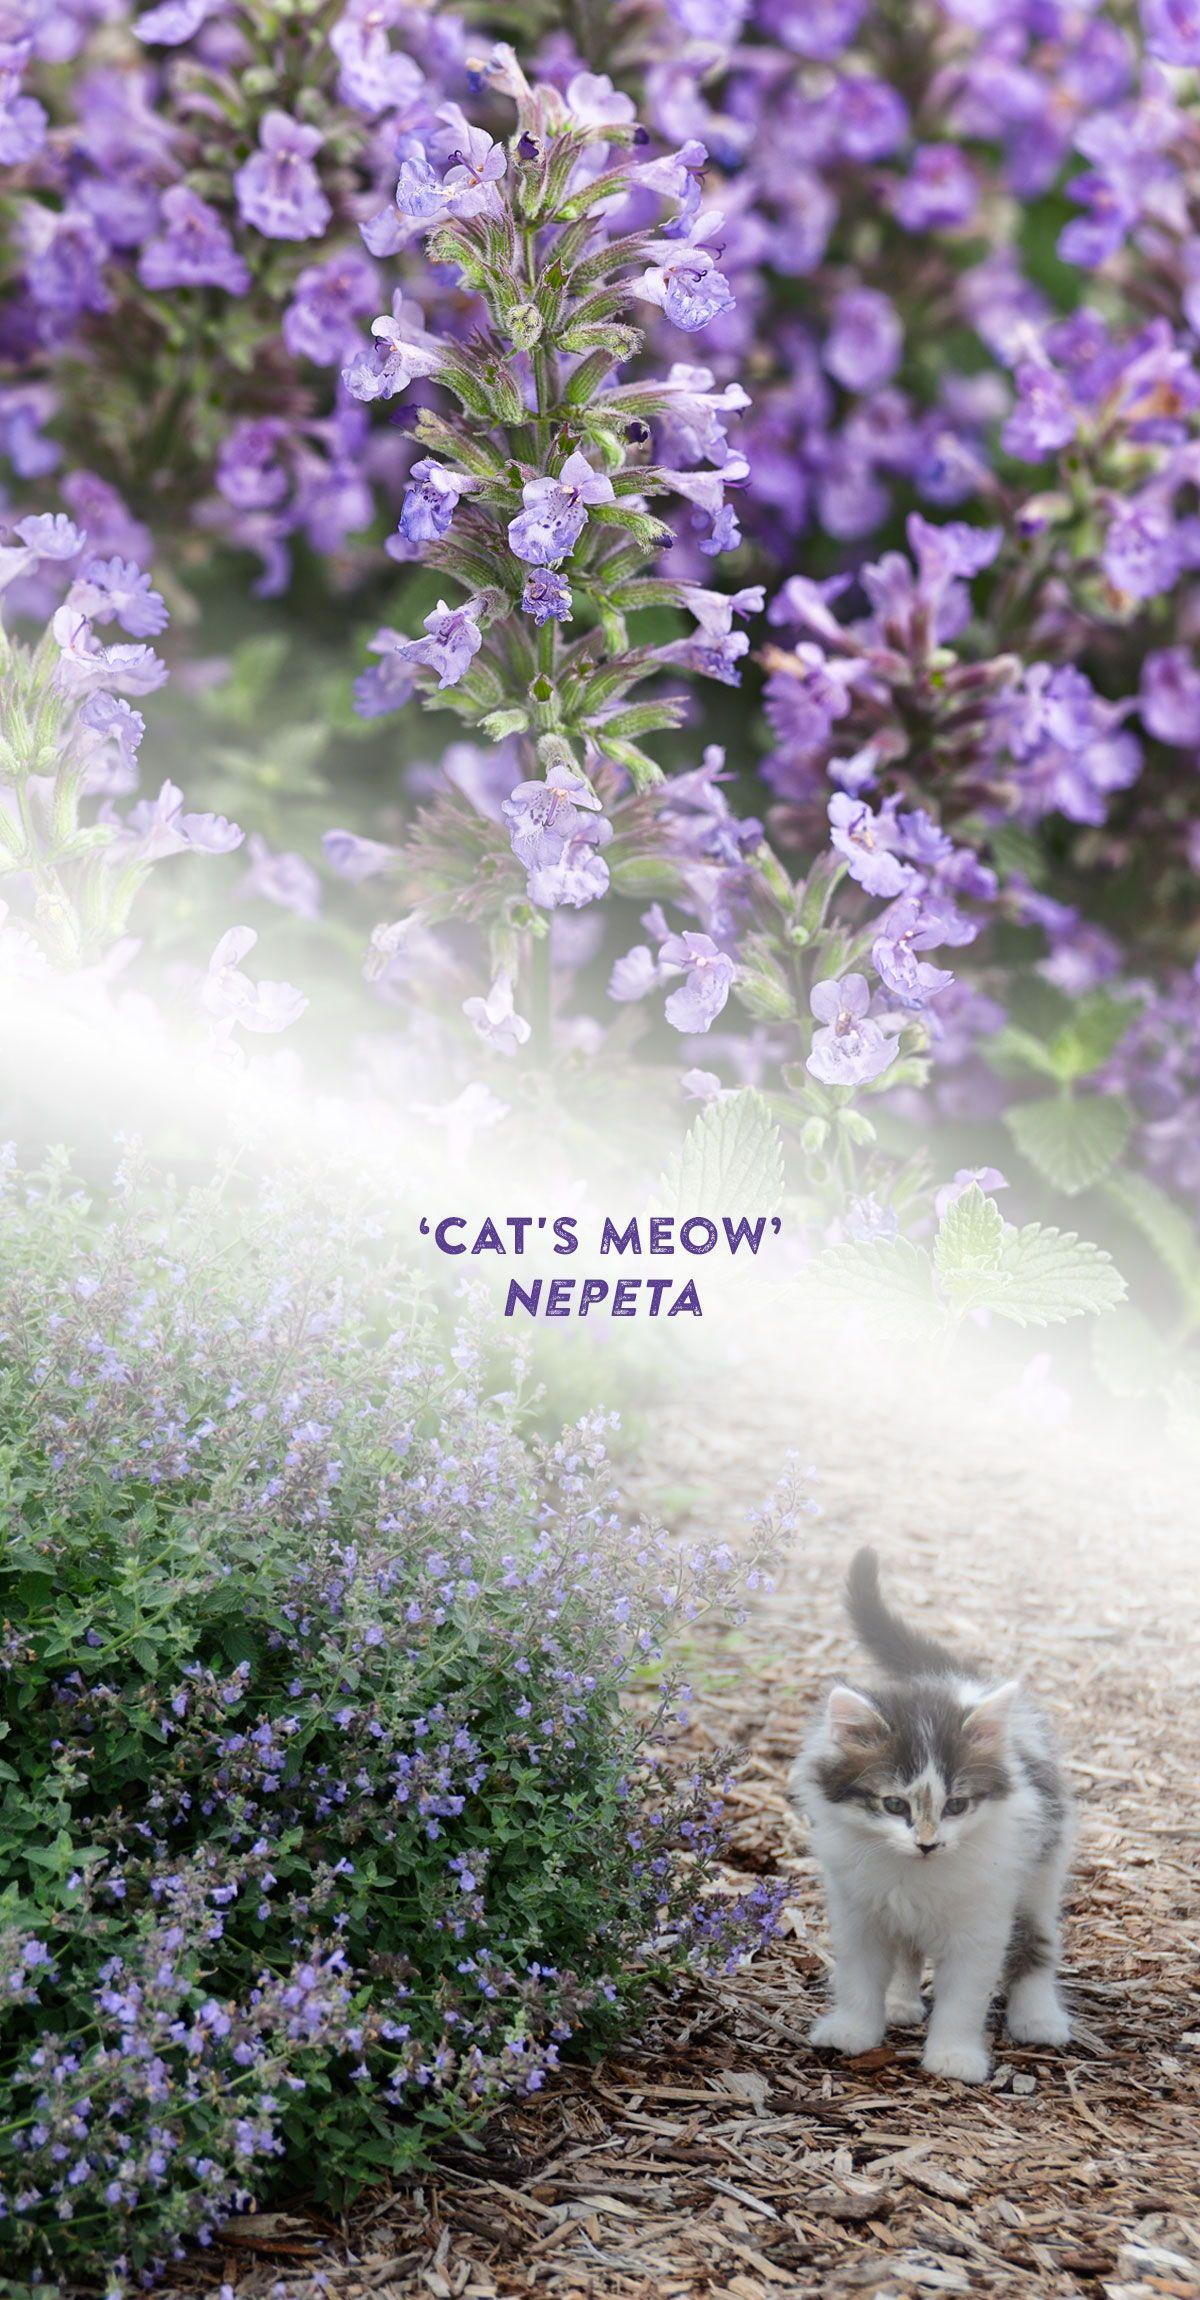 Cat's Meow Nepeta A Beautiful, Uniform Catmint in 2020